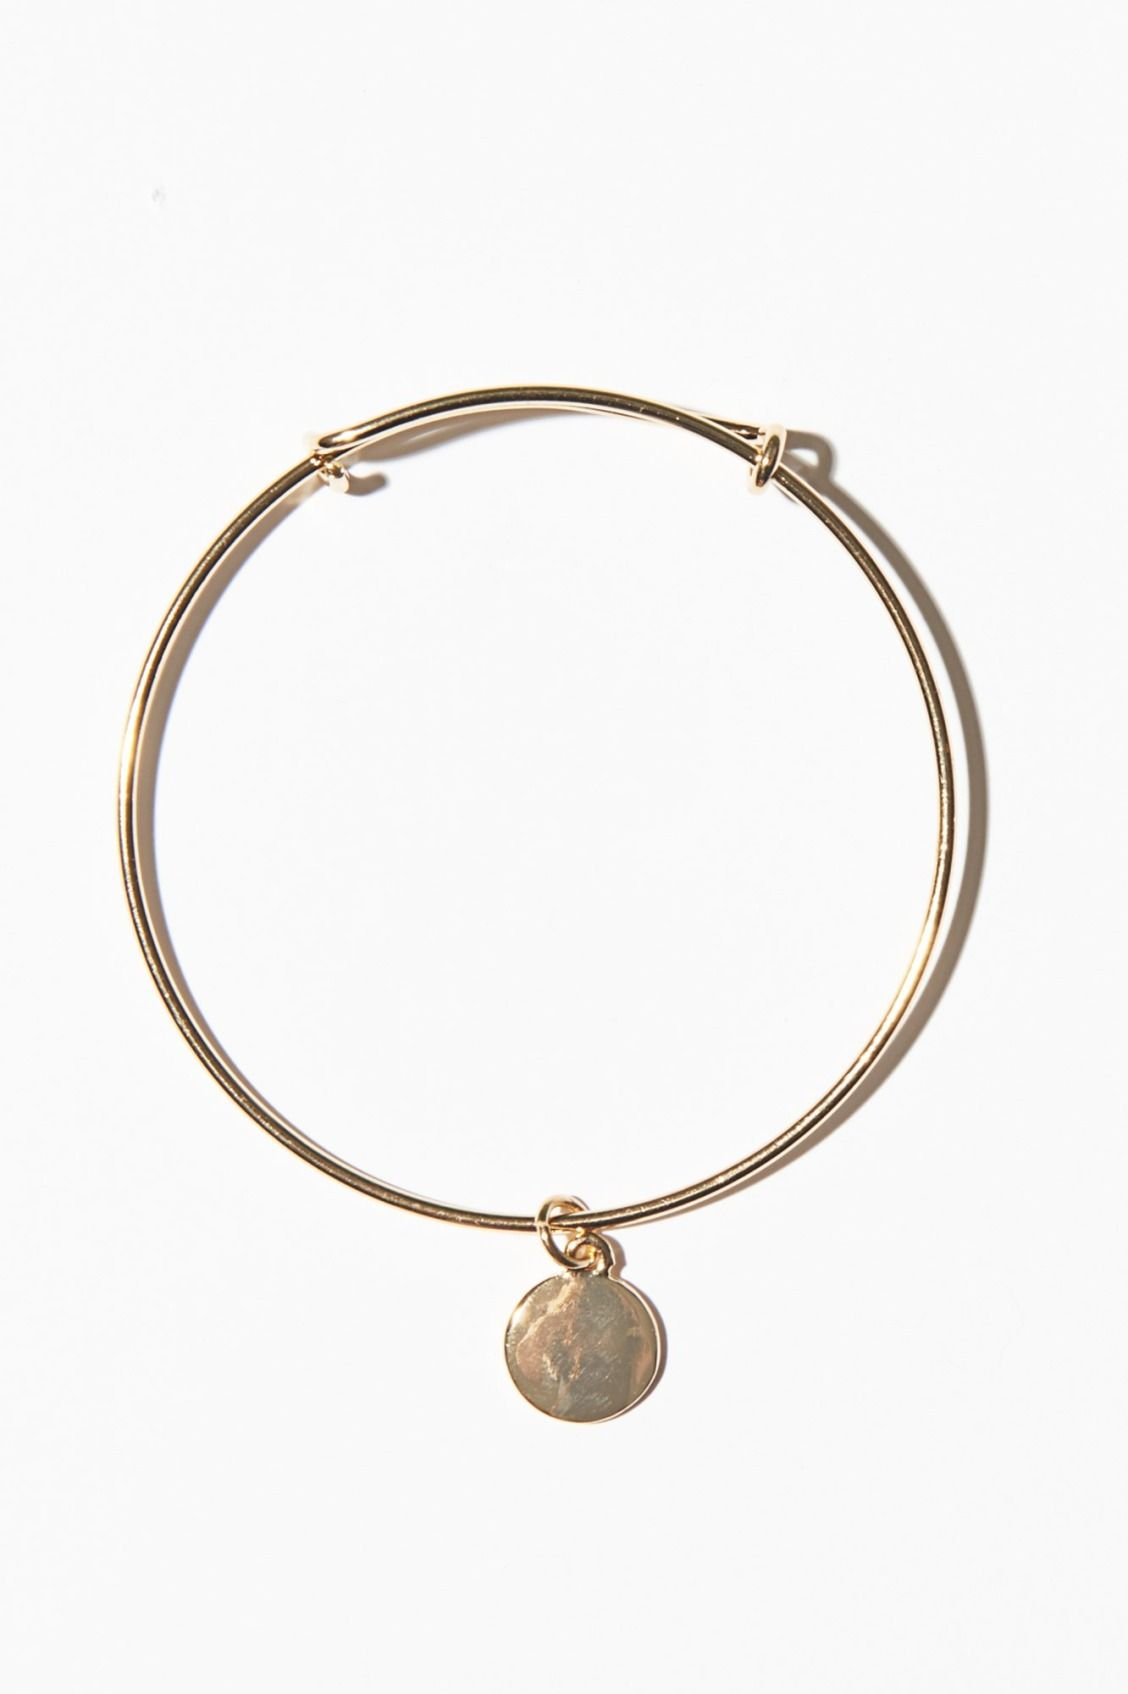 Thin Metal Bracelet With Charm